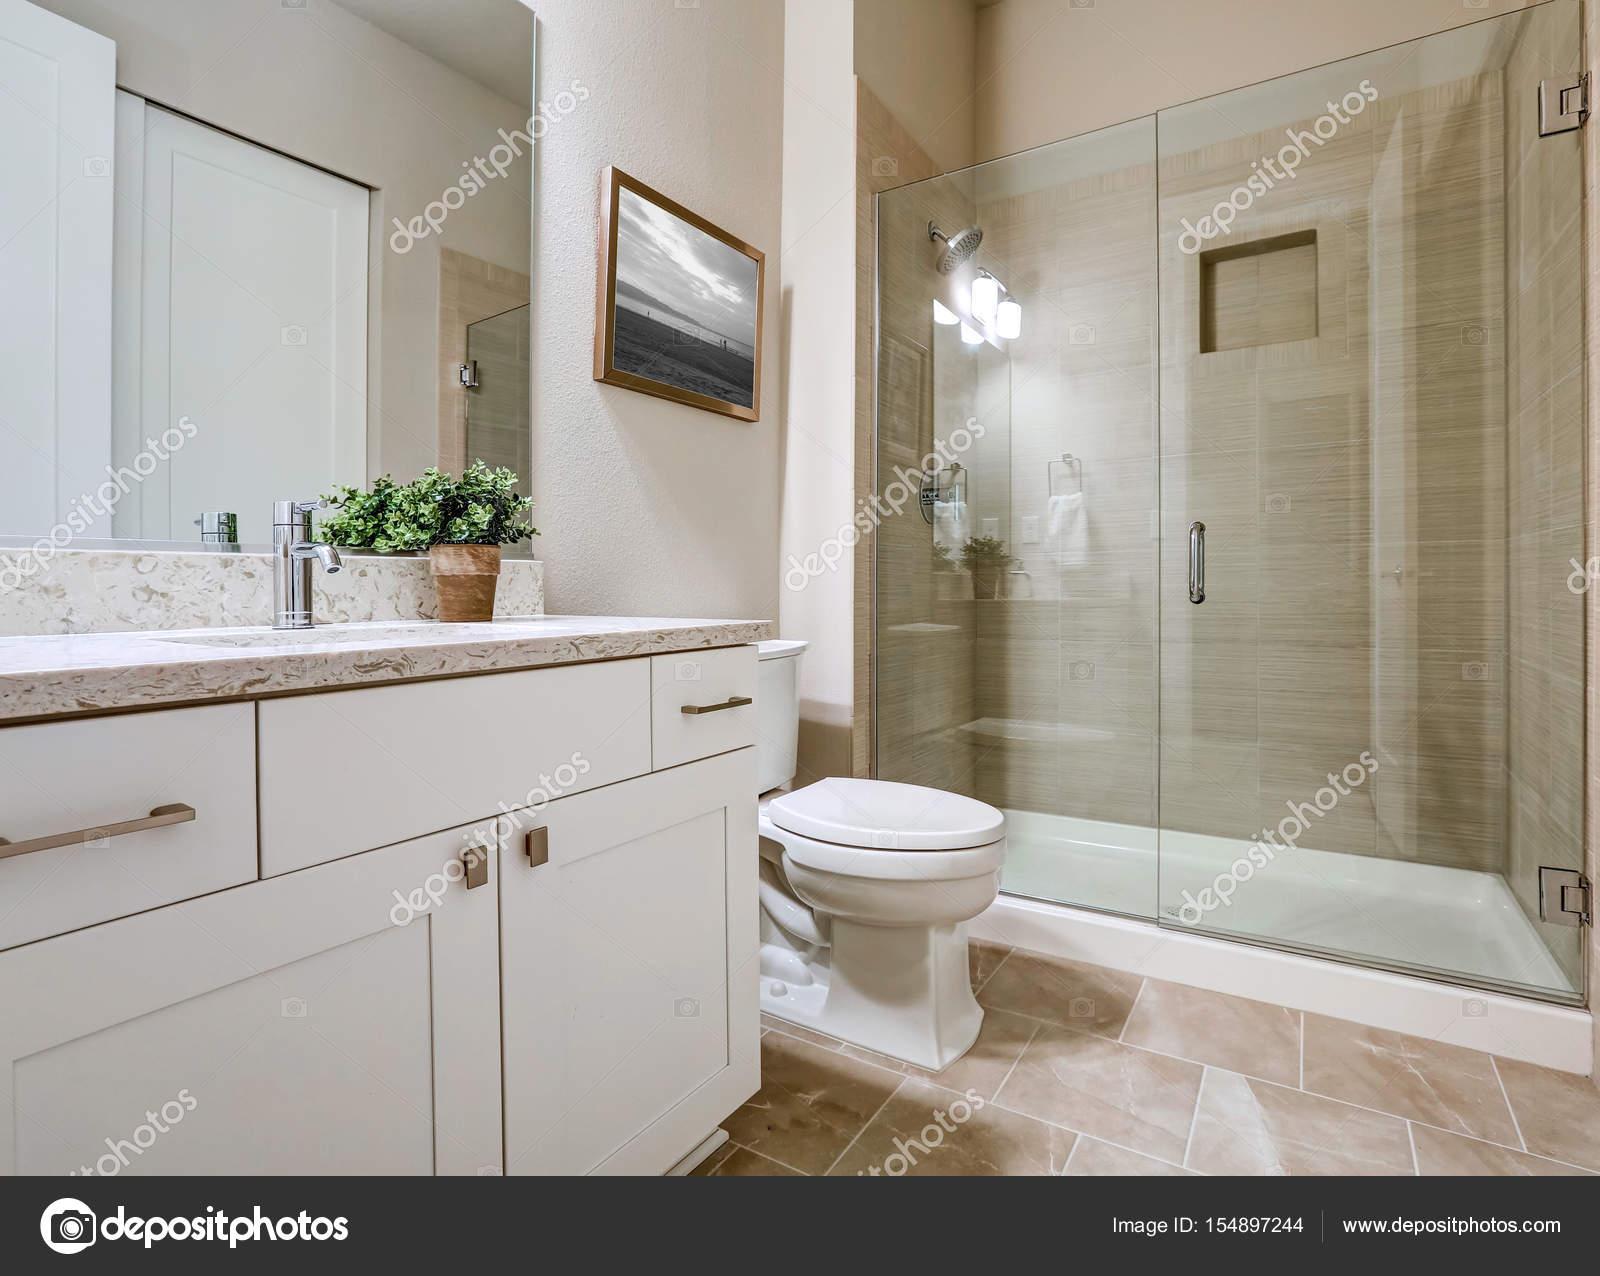 Tremendous Transitional Bathroom Interior Design In Soft Beige Colors Download Free Architecture Designs Pushbritishbridgeorg